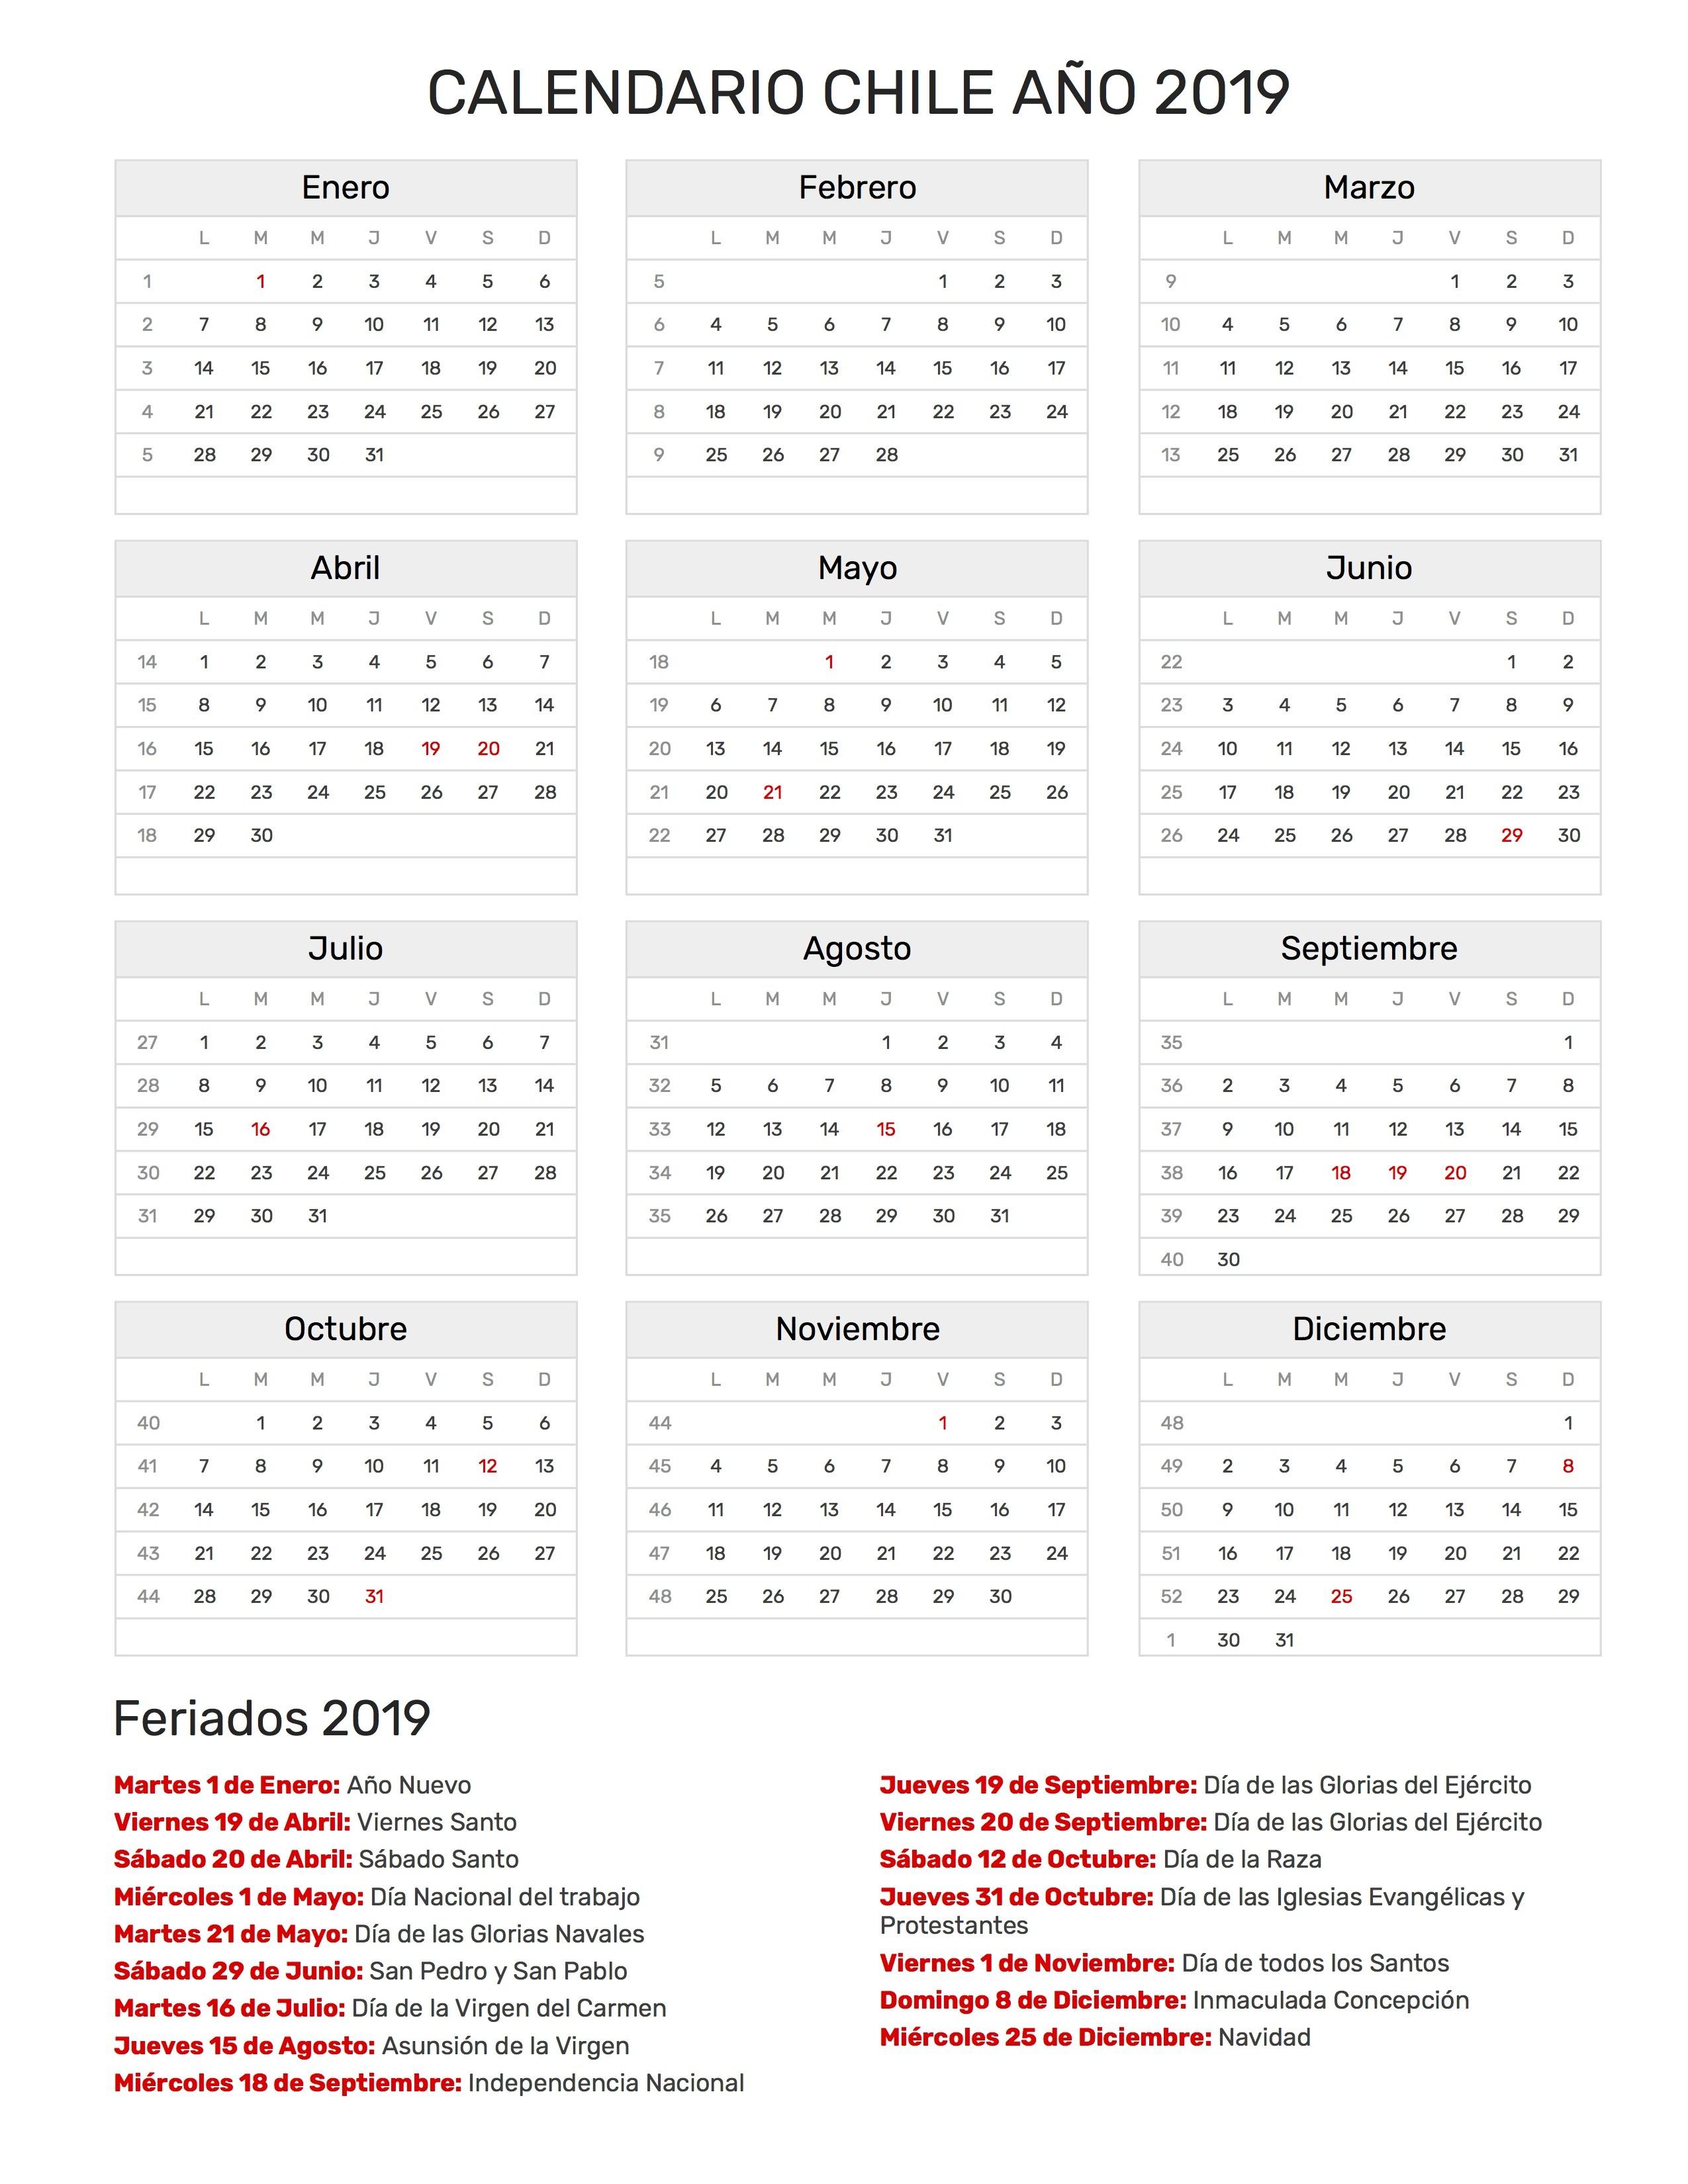 Calendario 2019 Argentina Para Imprimir Marzo Más Actual Calendario Chile A±o 2019 Of Calendario 2019 Argentina Para Imprimir Marzo Más Arriba-a-fecha Calendario Octubre 2018 Cal2018 Pinterest